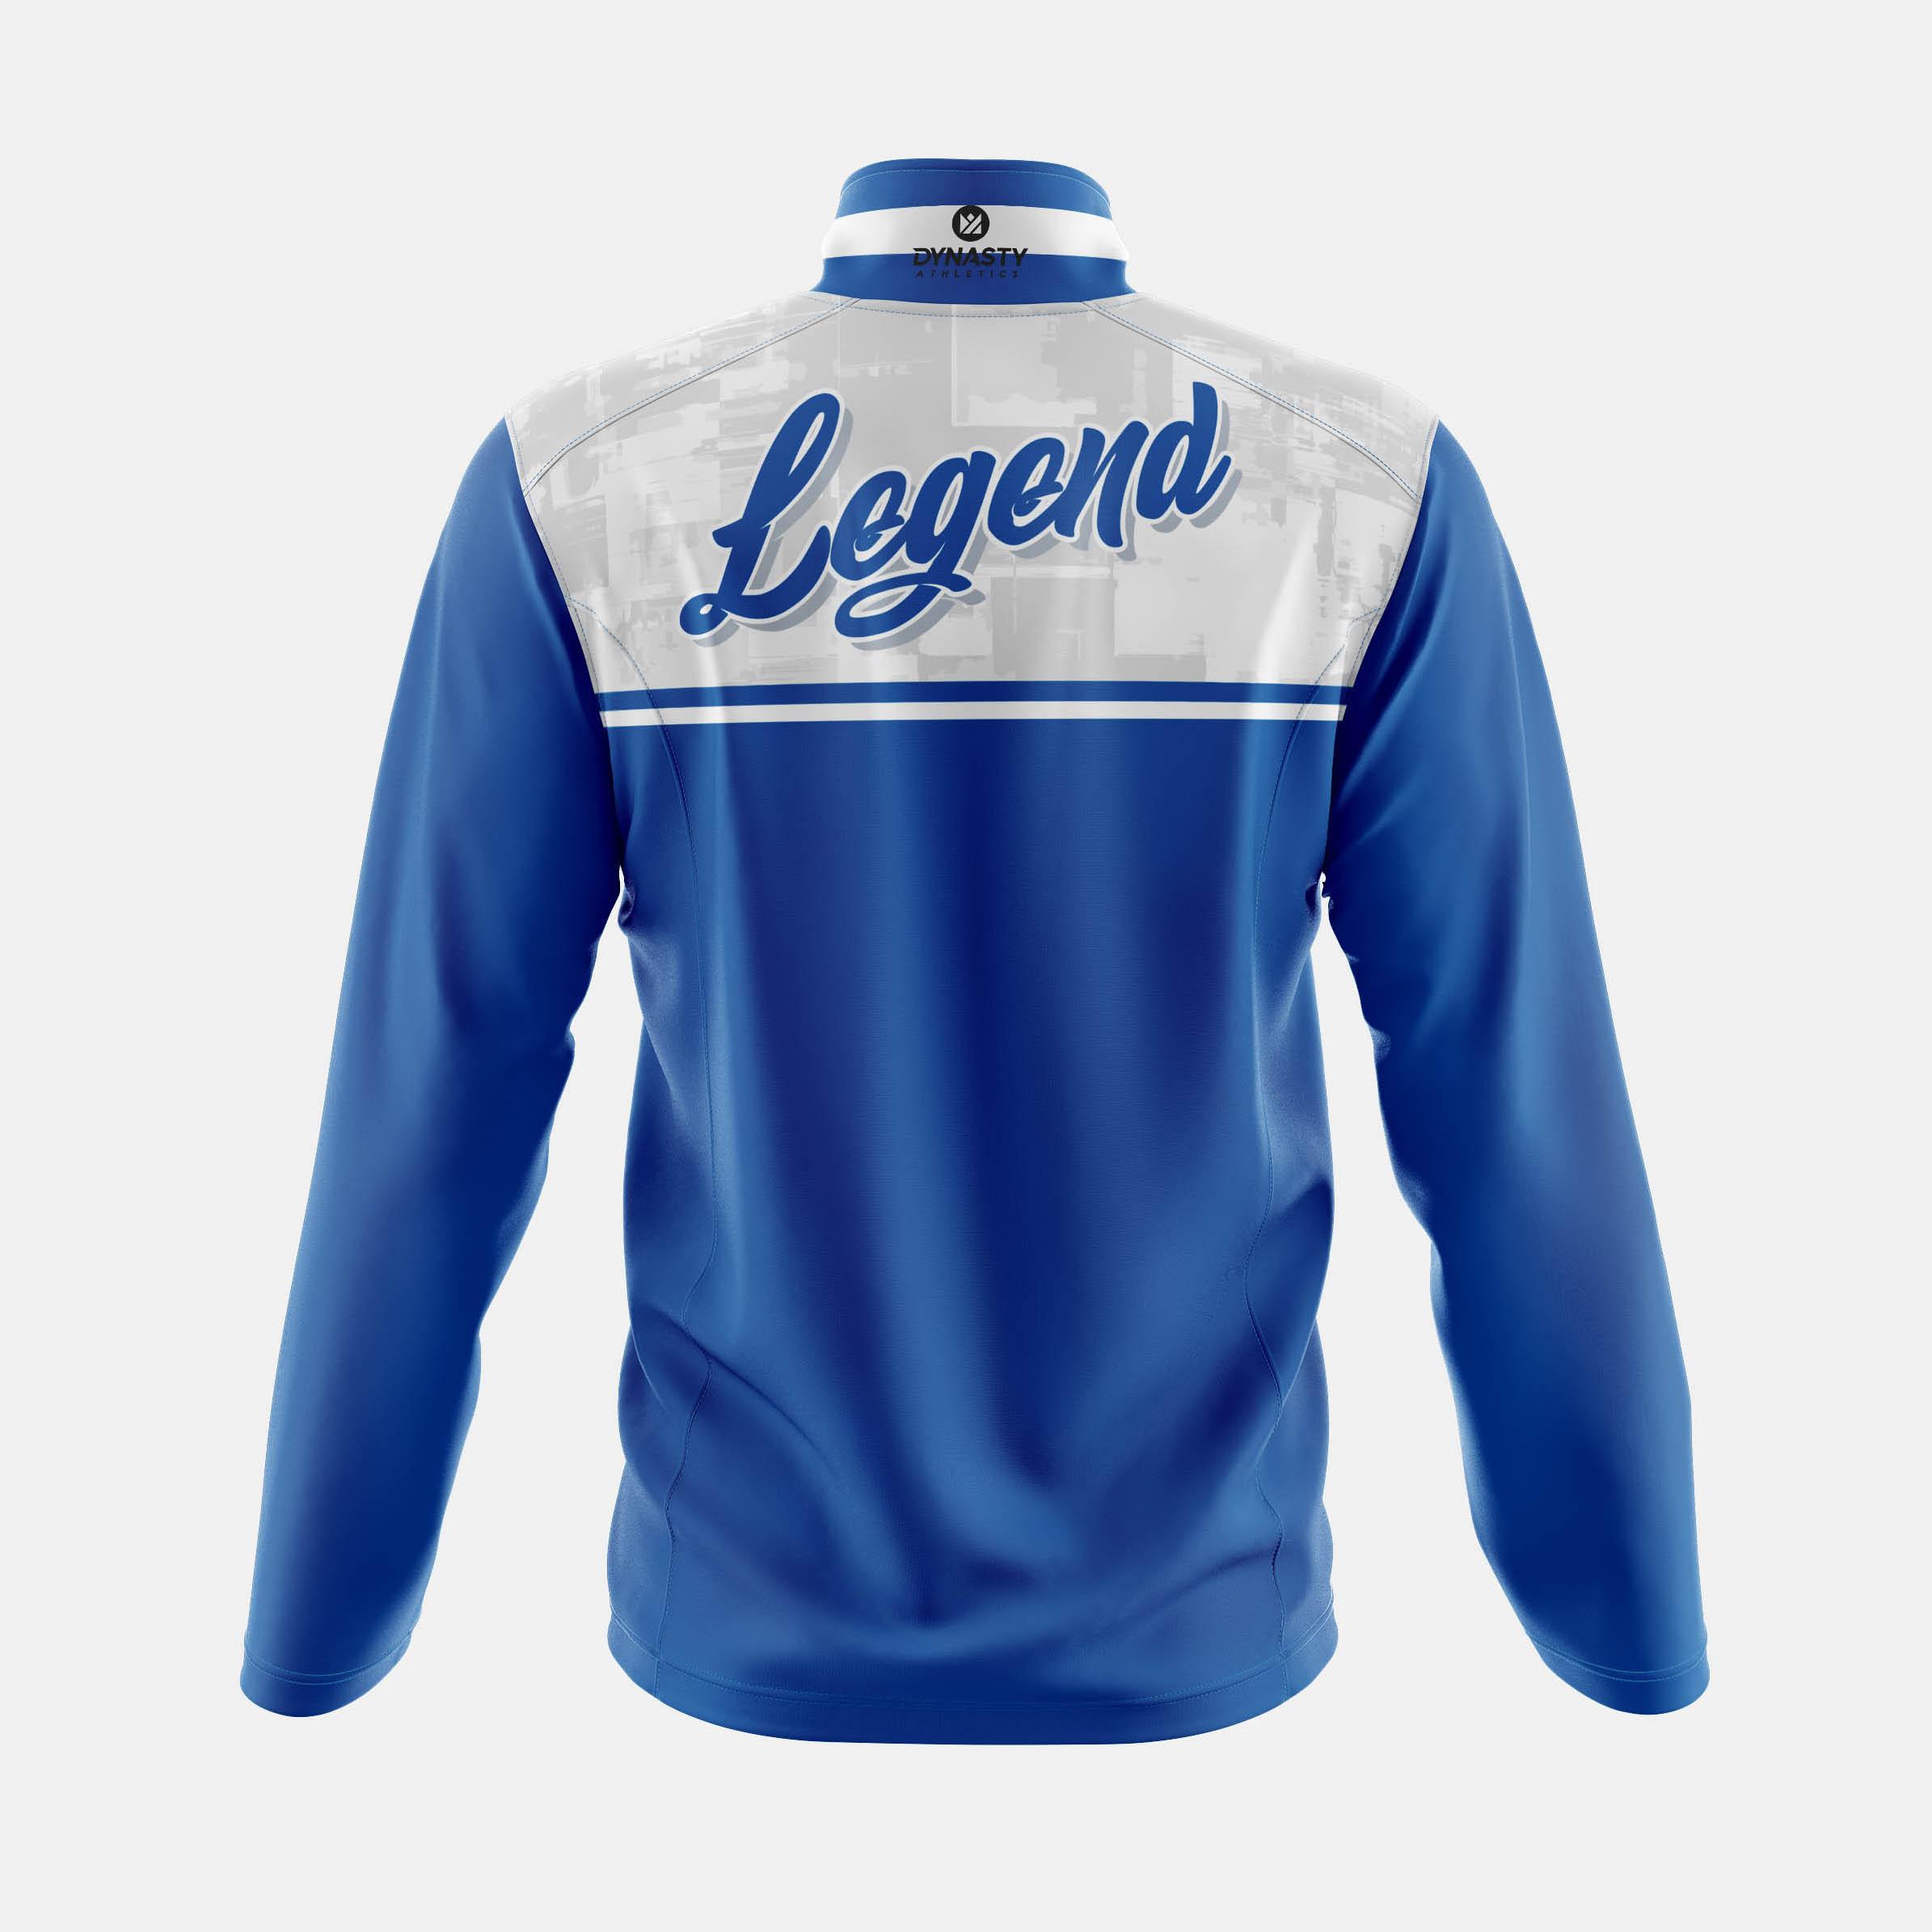 Legend Qtr Zip Tack Jacket Back View